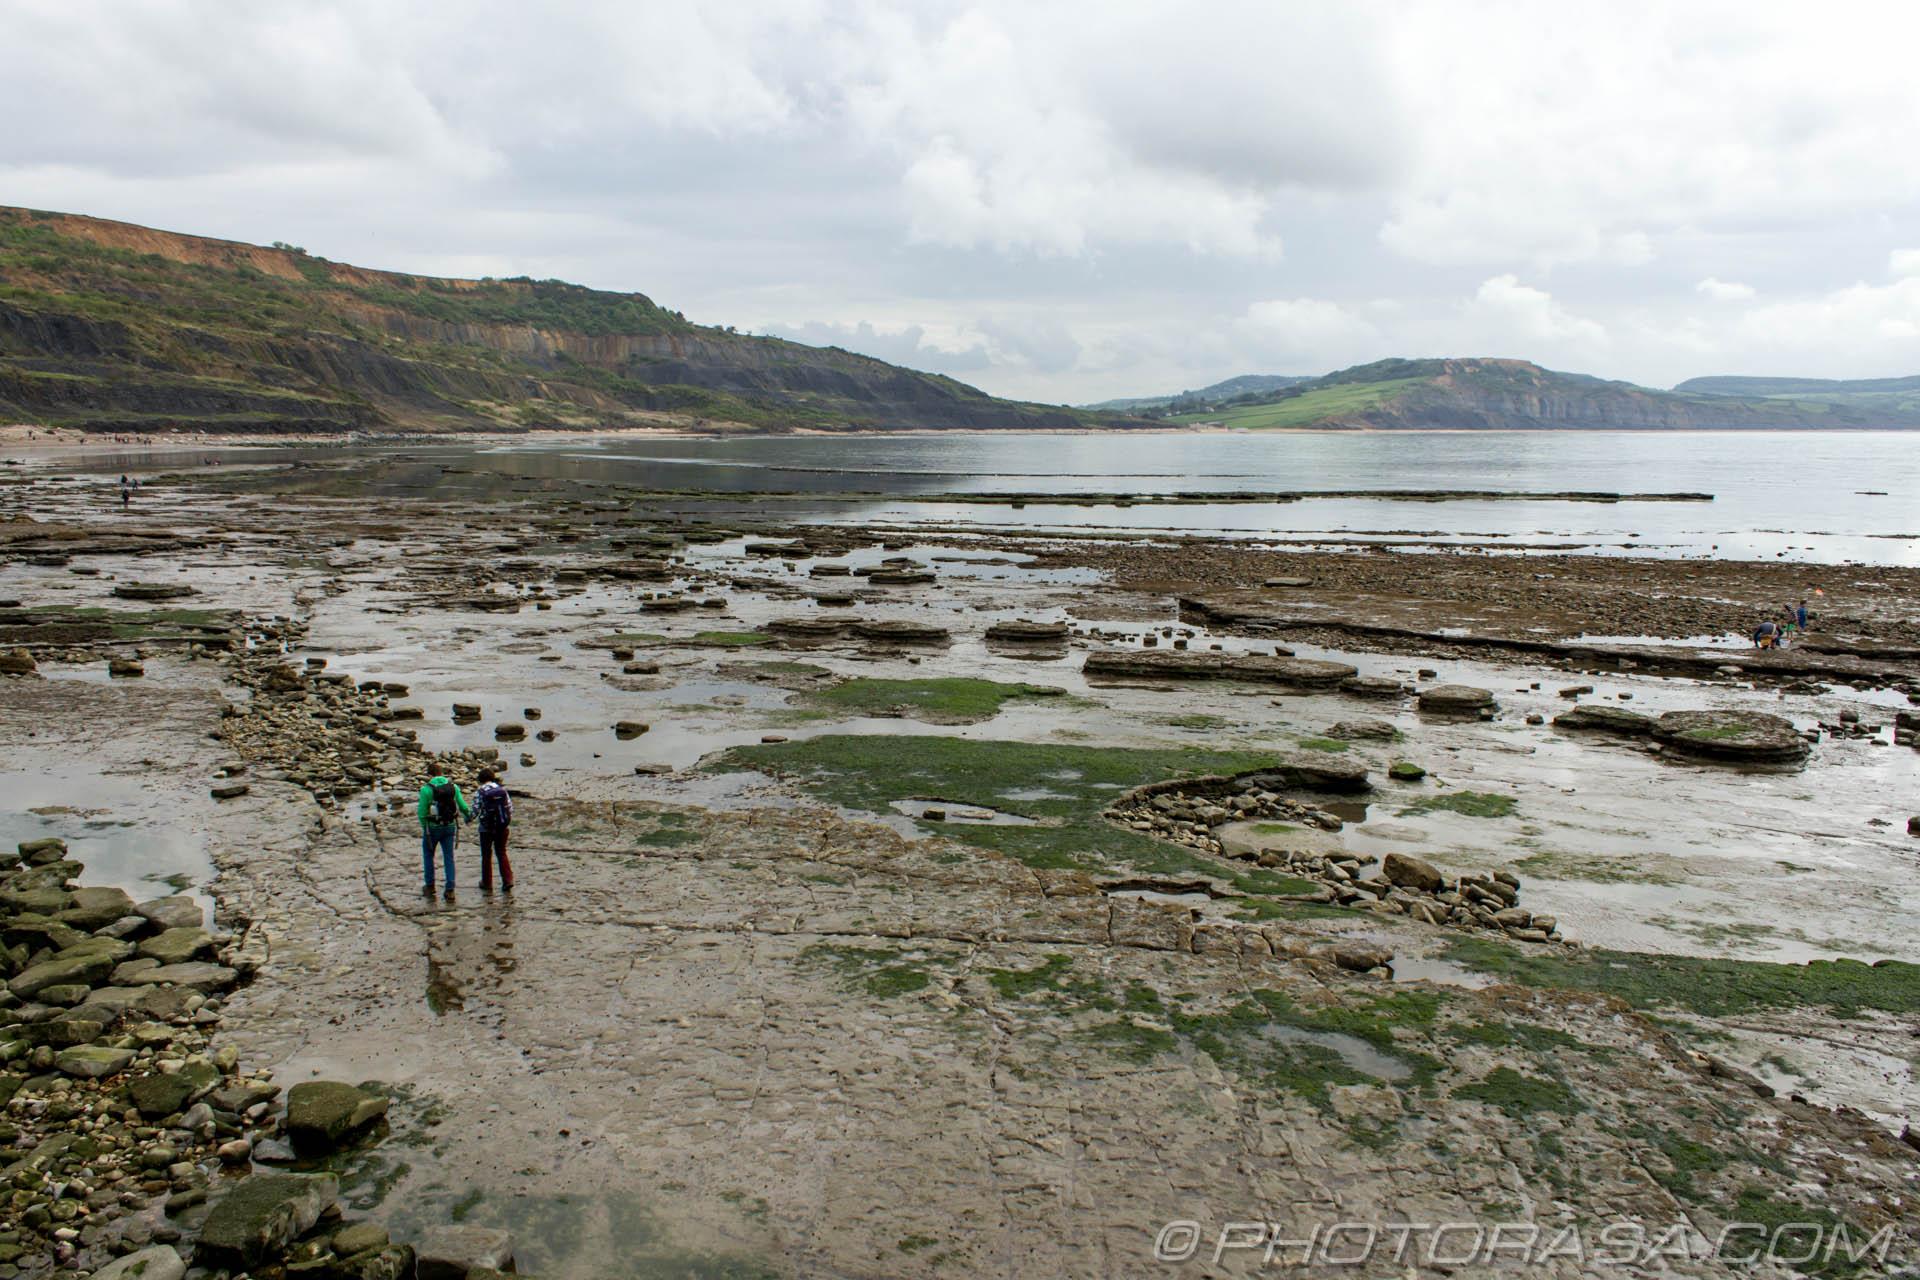 https://photorasa.com/jurassic-coast-lyme-regis/couple-walking-on-jurassic-beach/